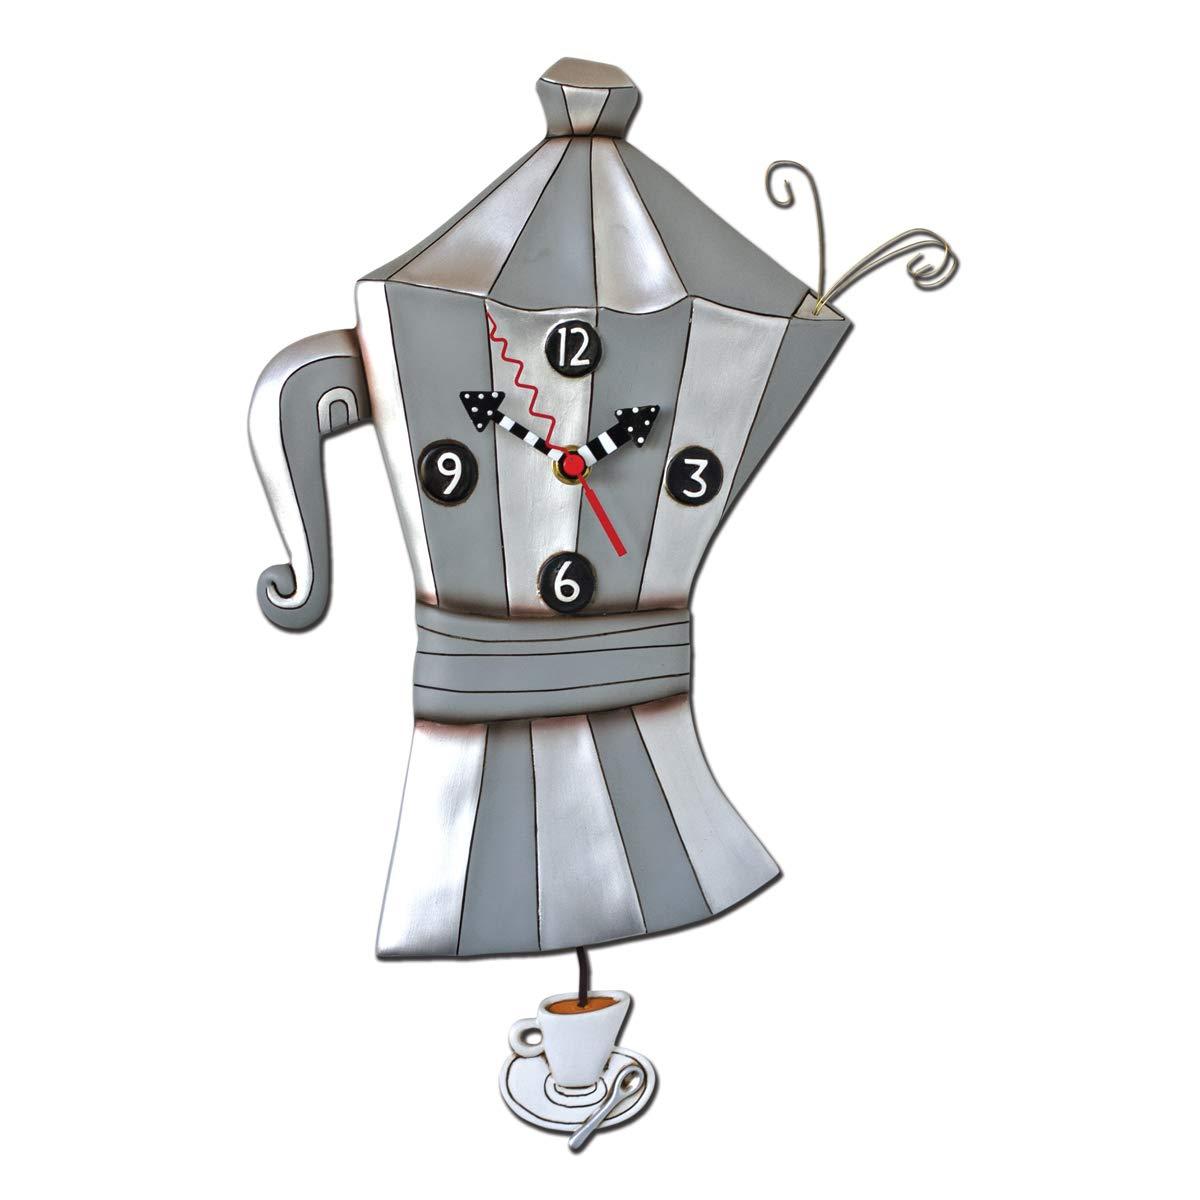 Allen Designs P6180 - Reloj de pared gris (cafetera)- 37.5x24 cm ...